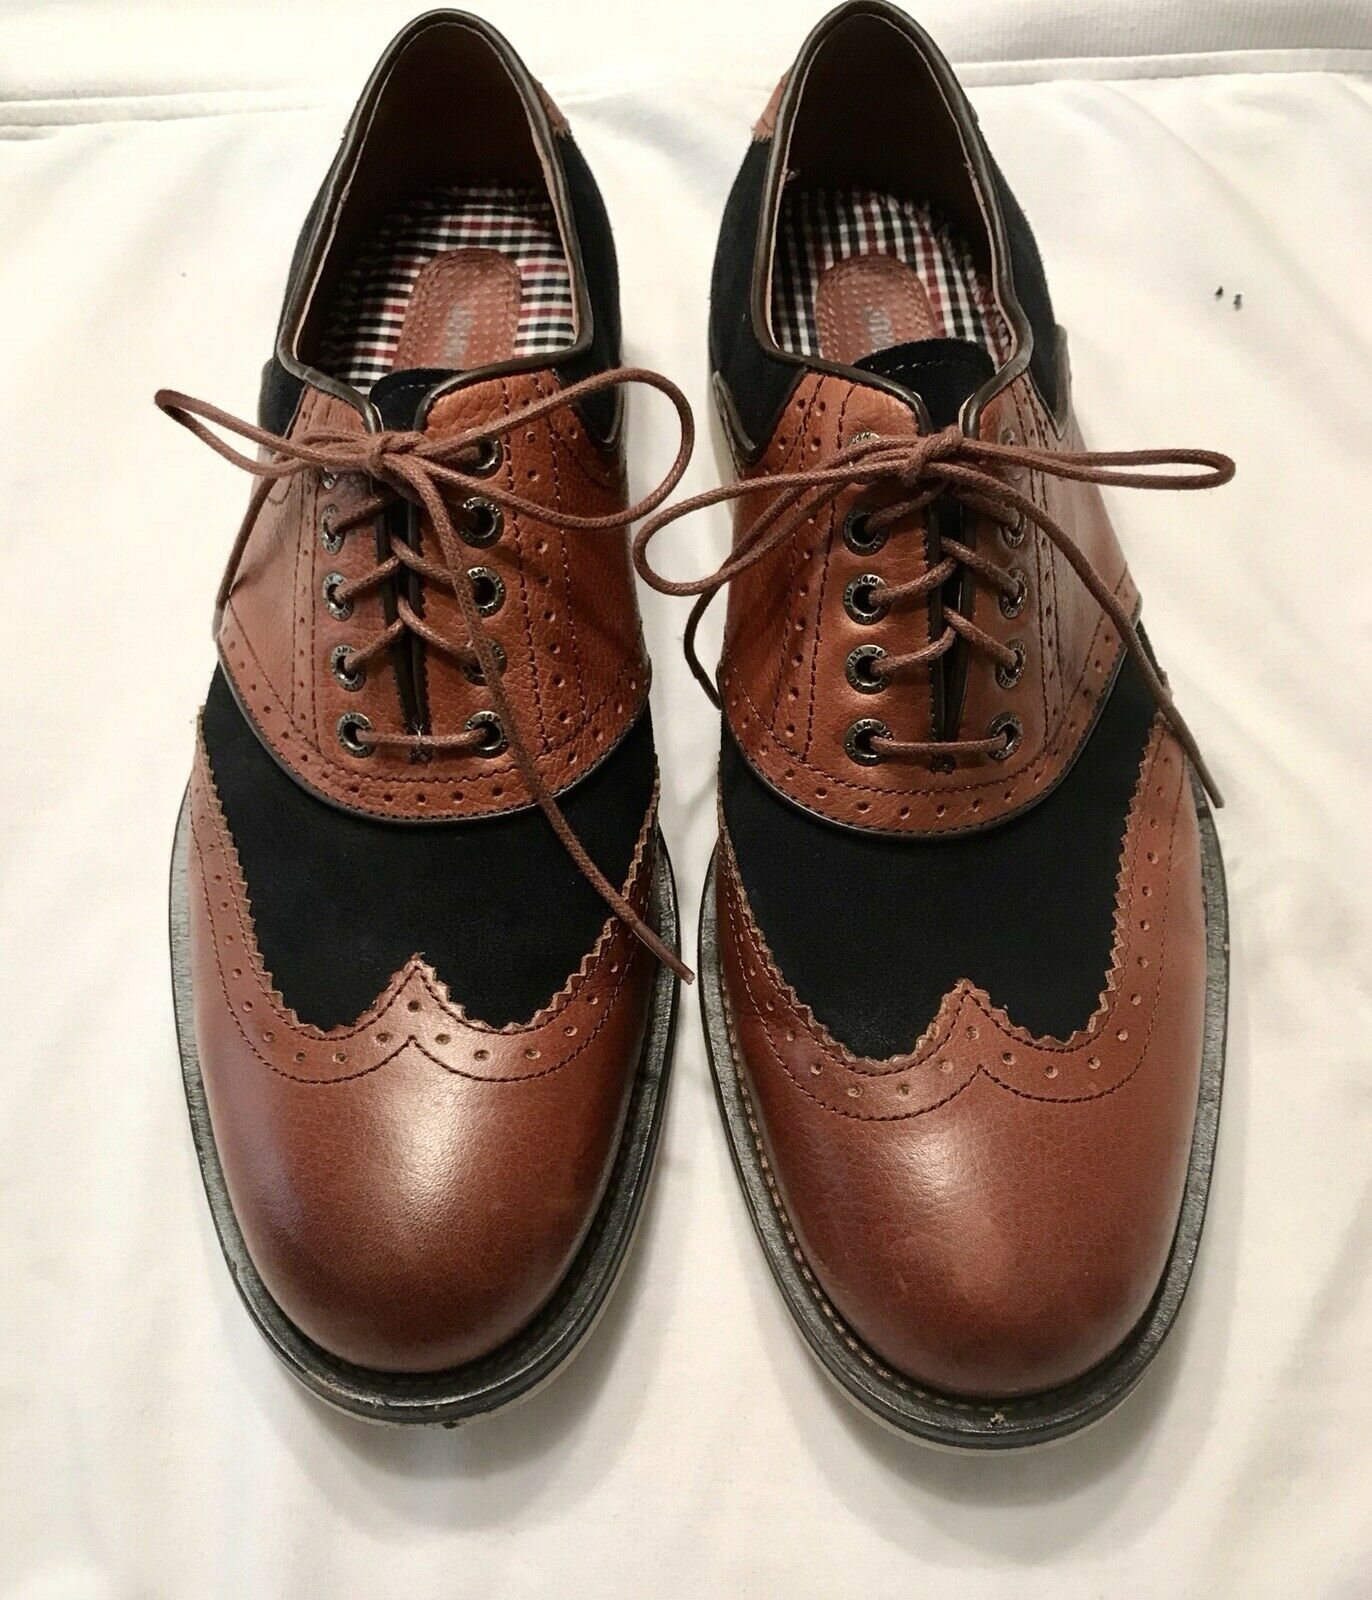 Johnston & Murphy Mens Navy Brown Flex System Wingtip Oxfords Shoes 9.5M Superb!